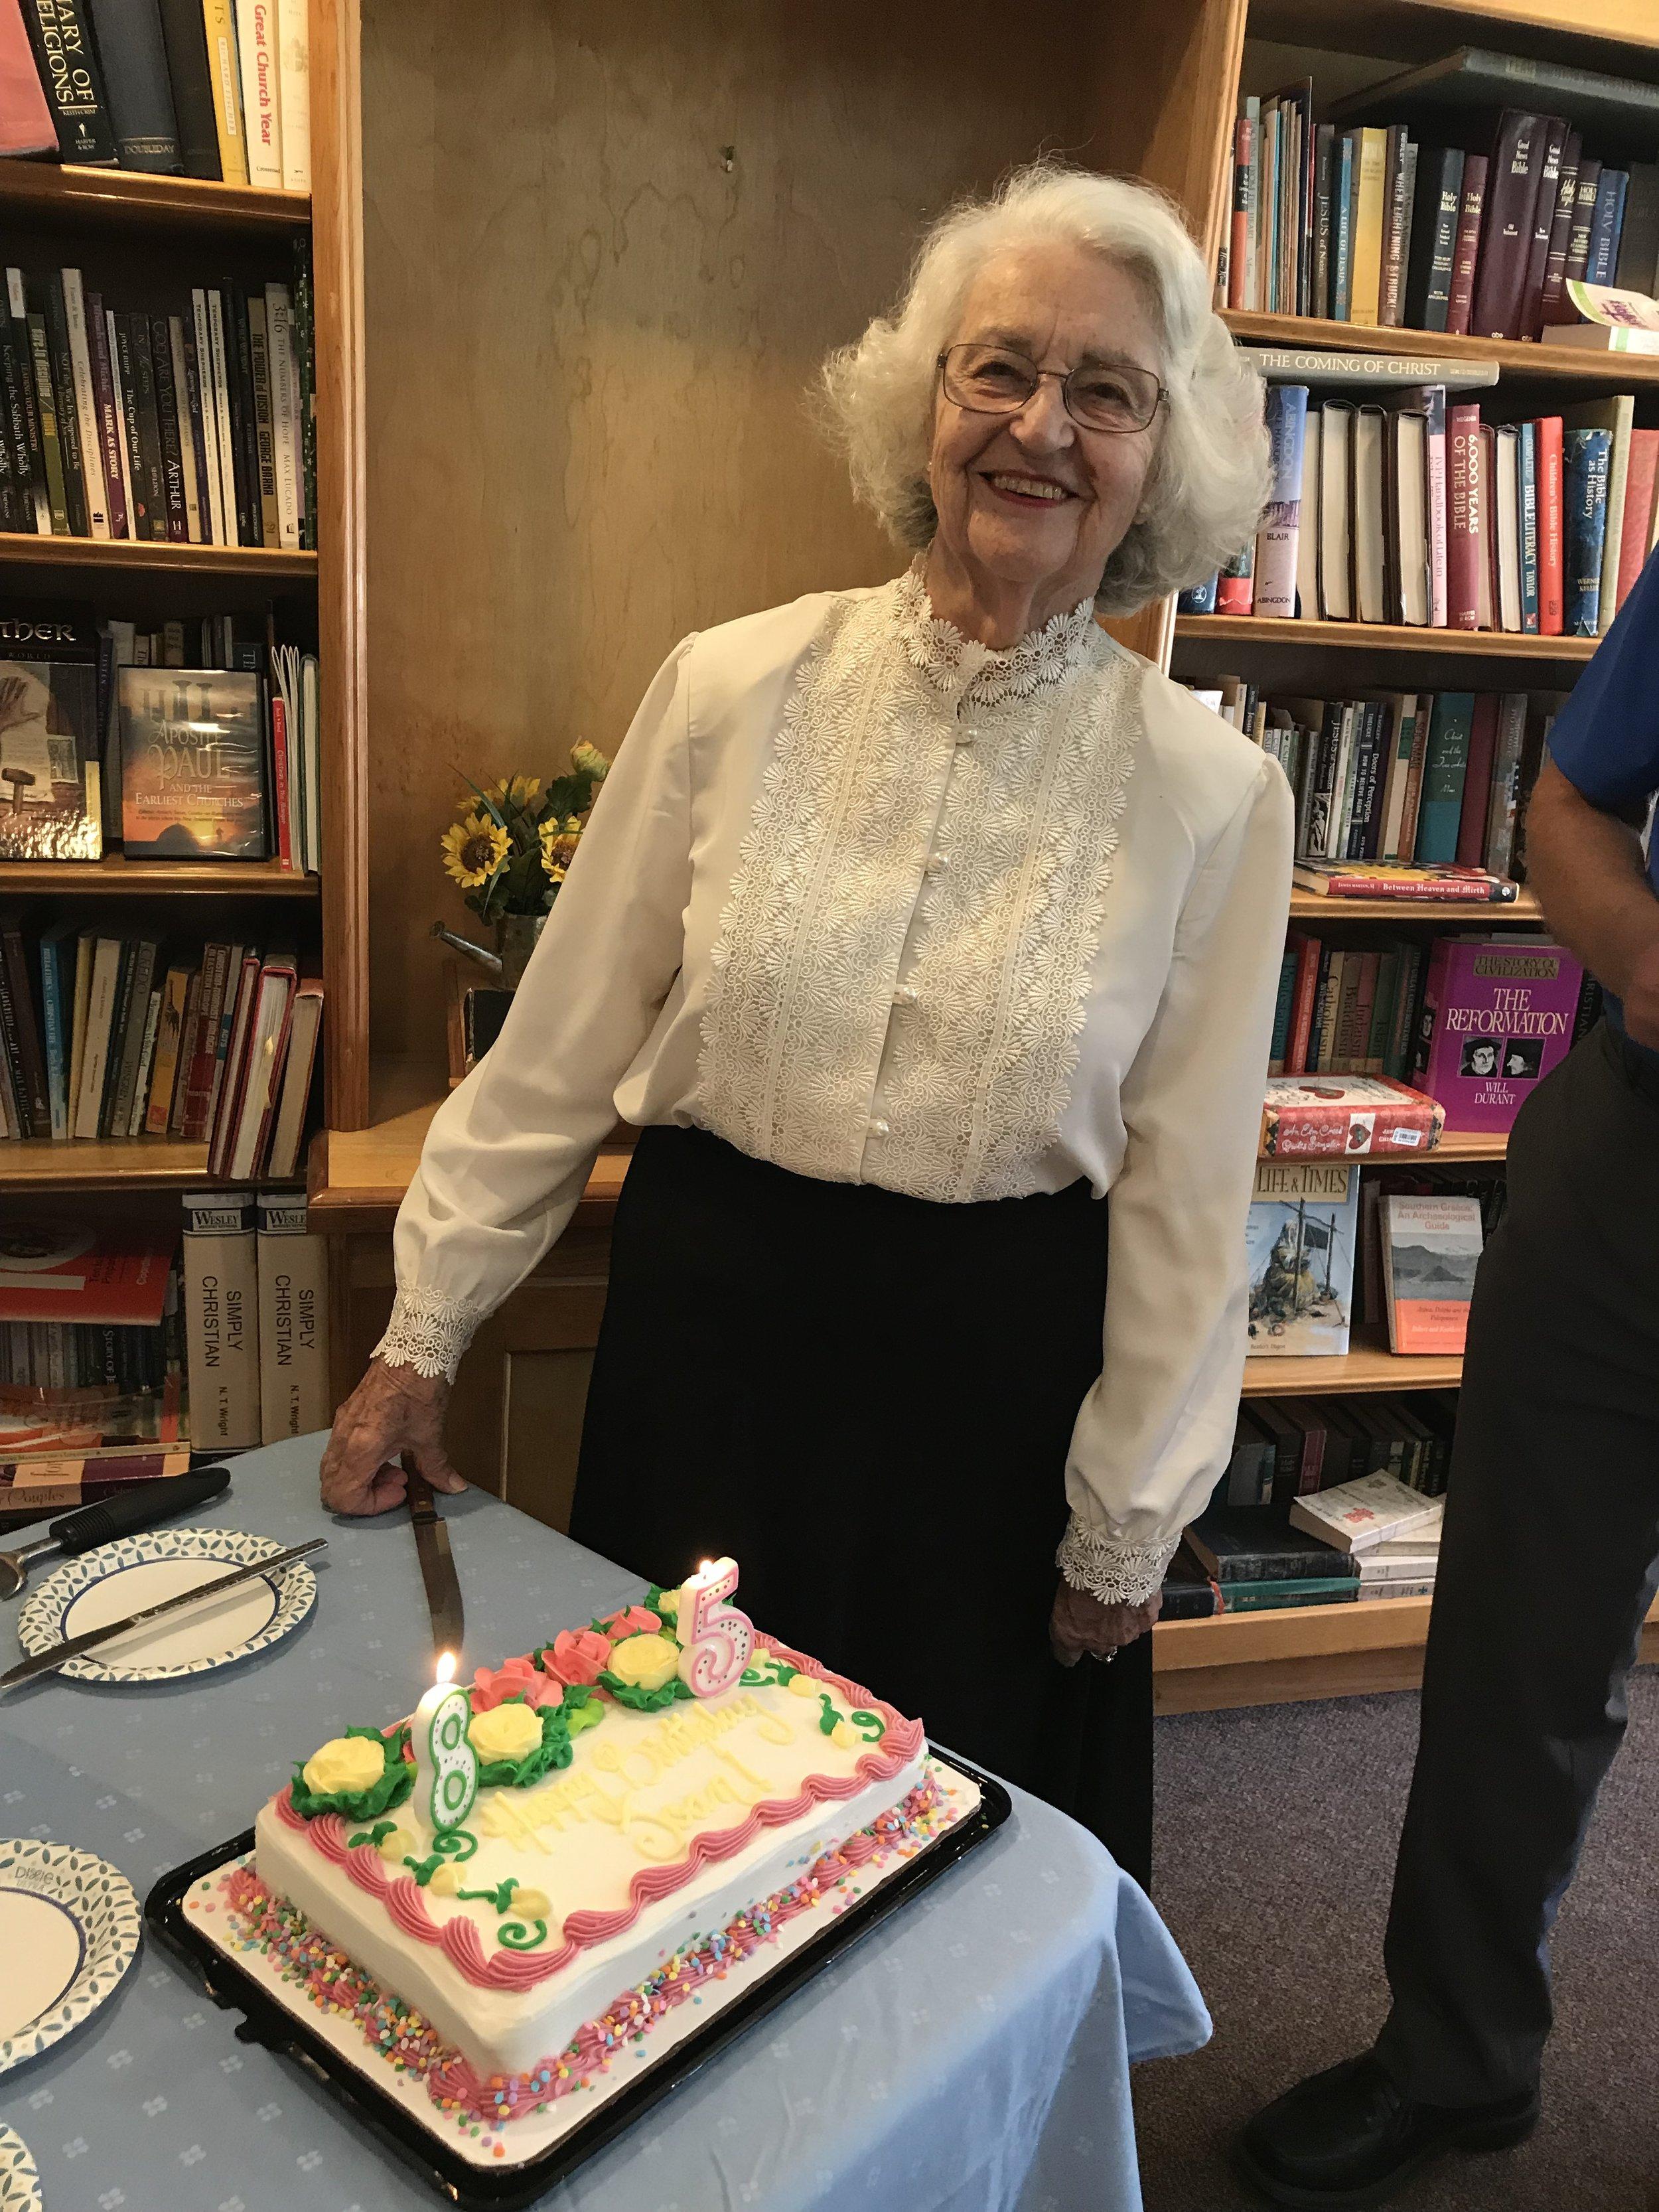 Our dear member Joan celebrating her 85th birthday!